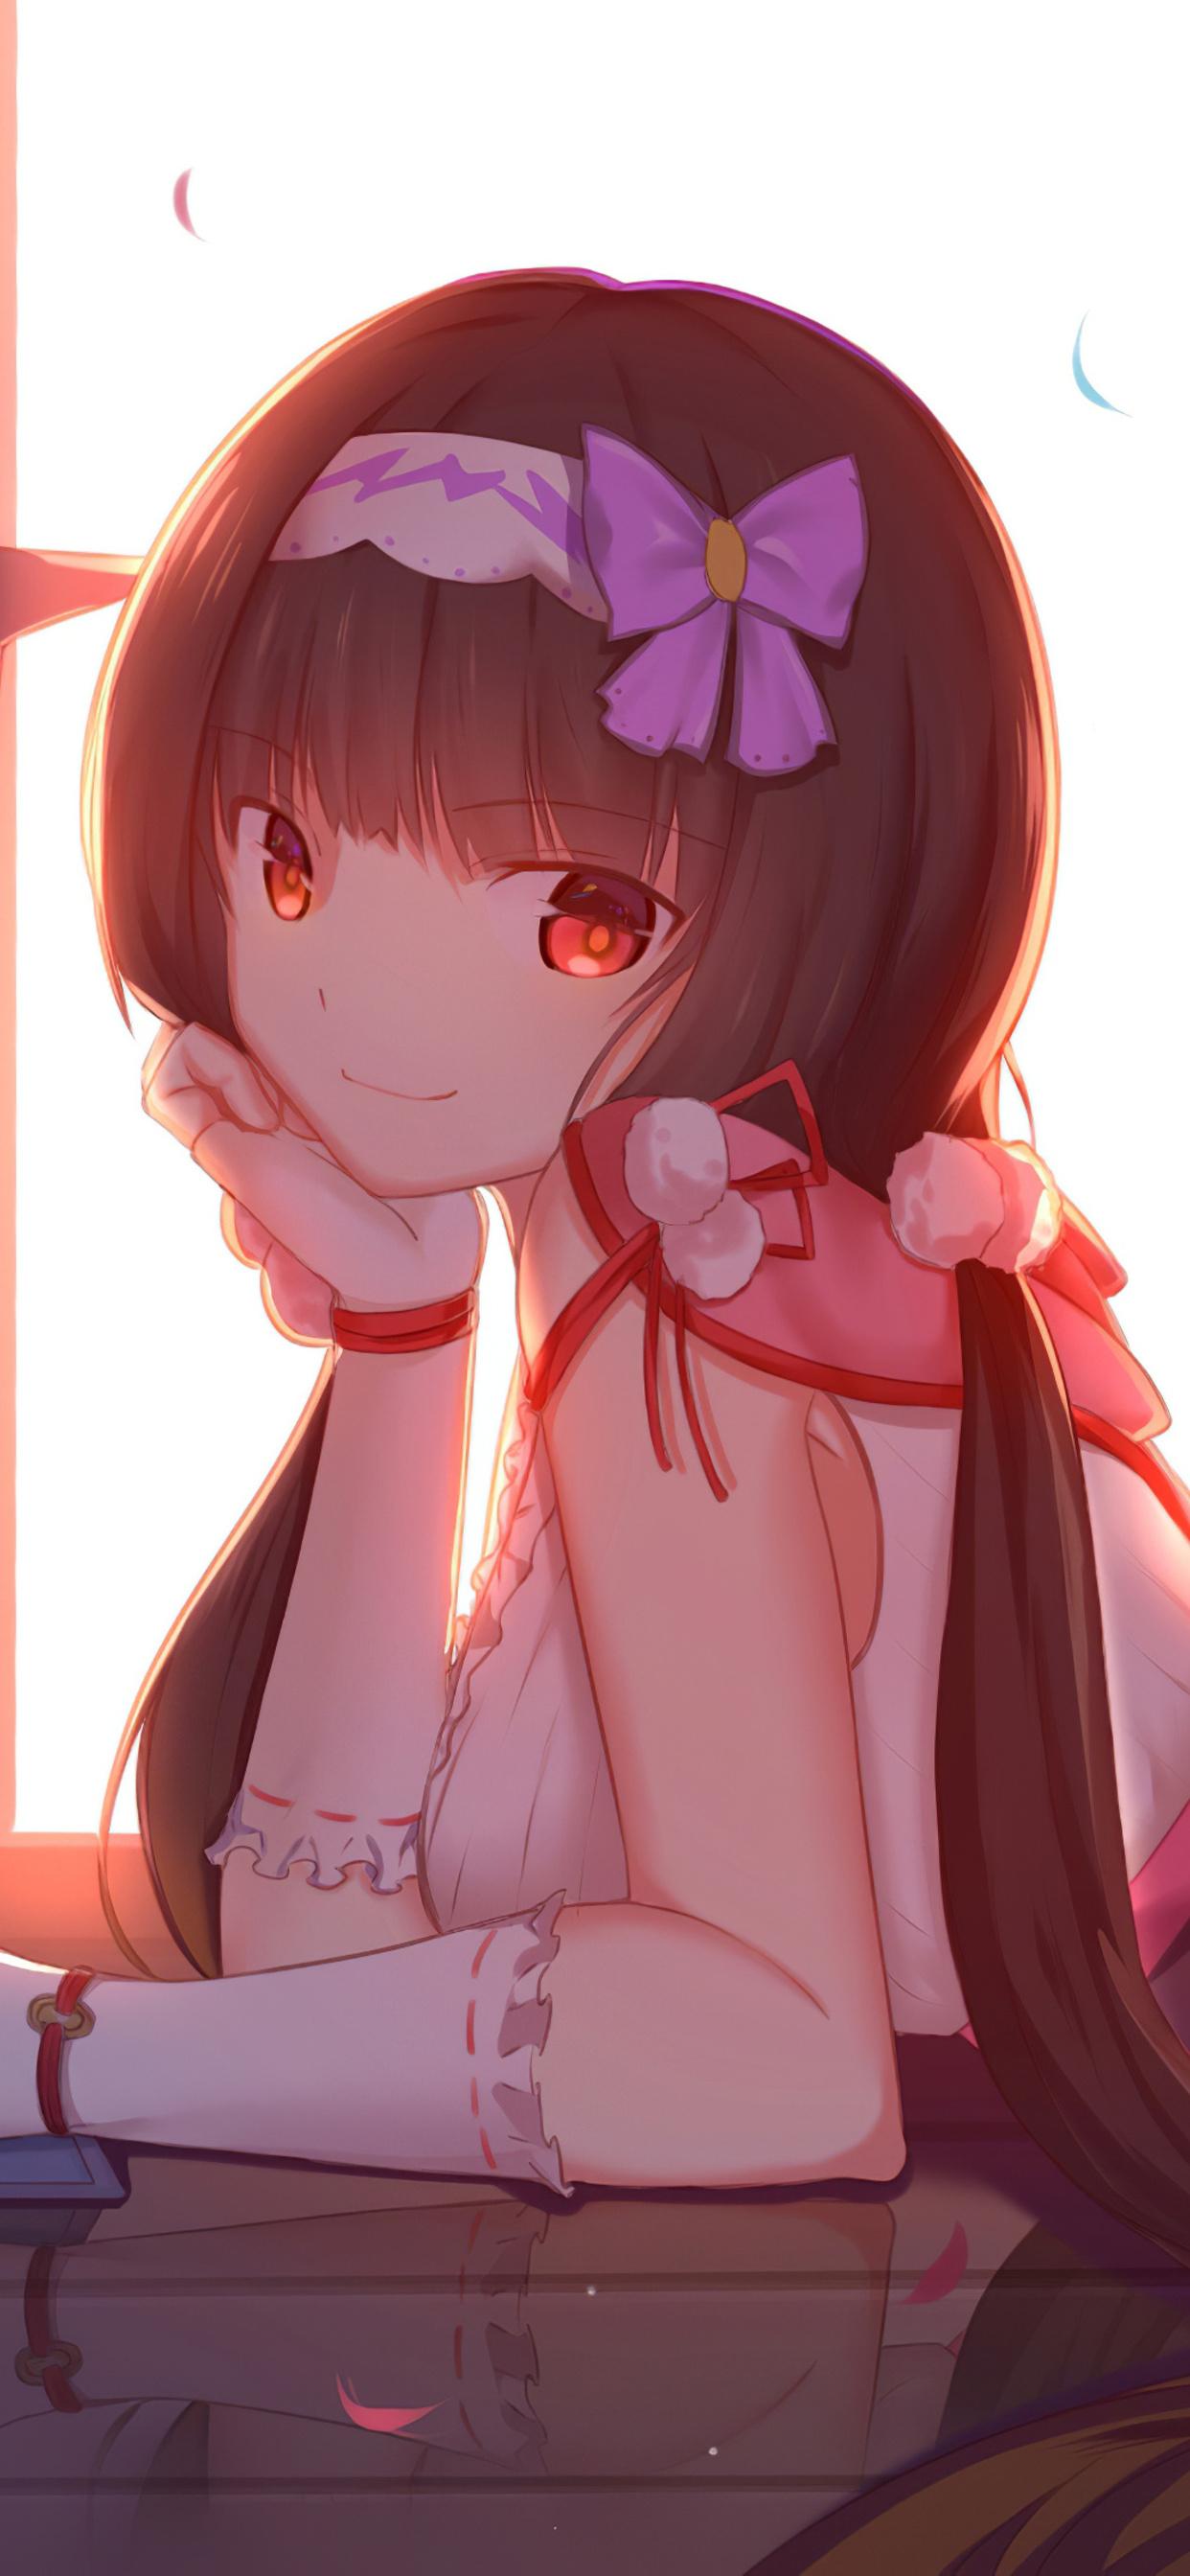 fate-grand-order-anime-girl-4k-4y.jpg